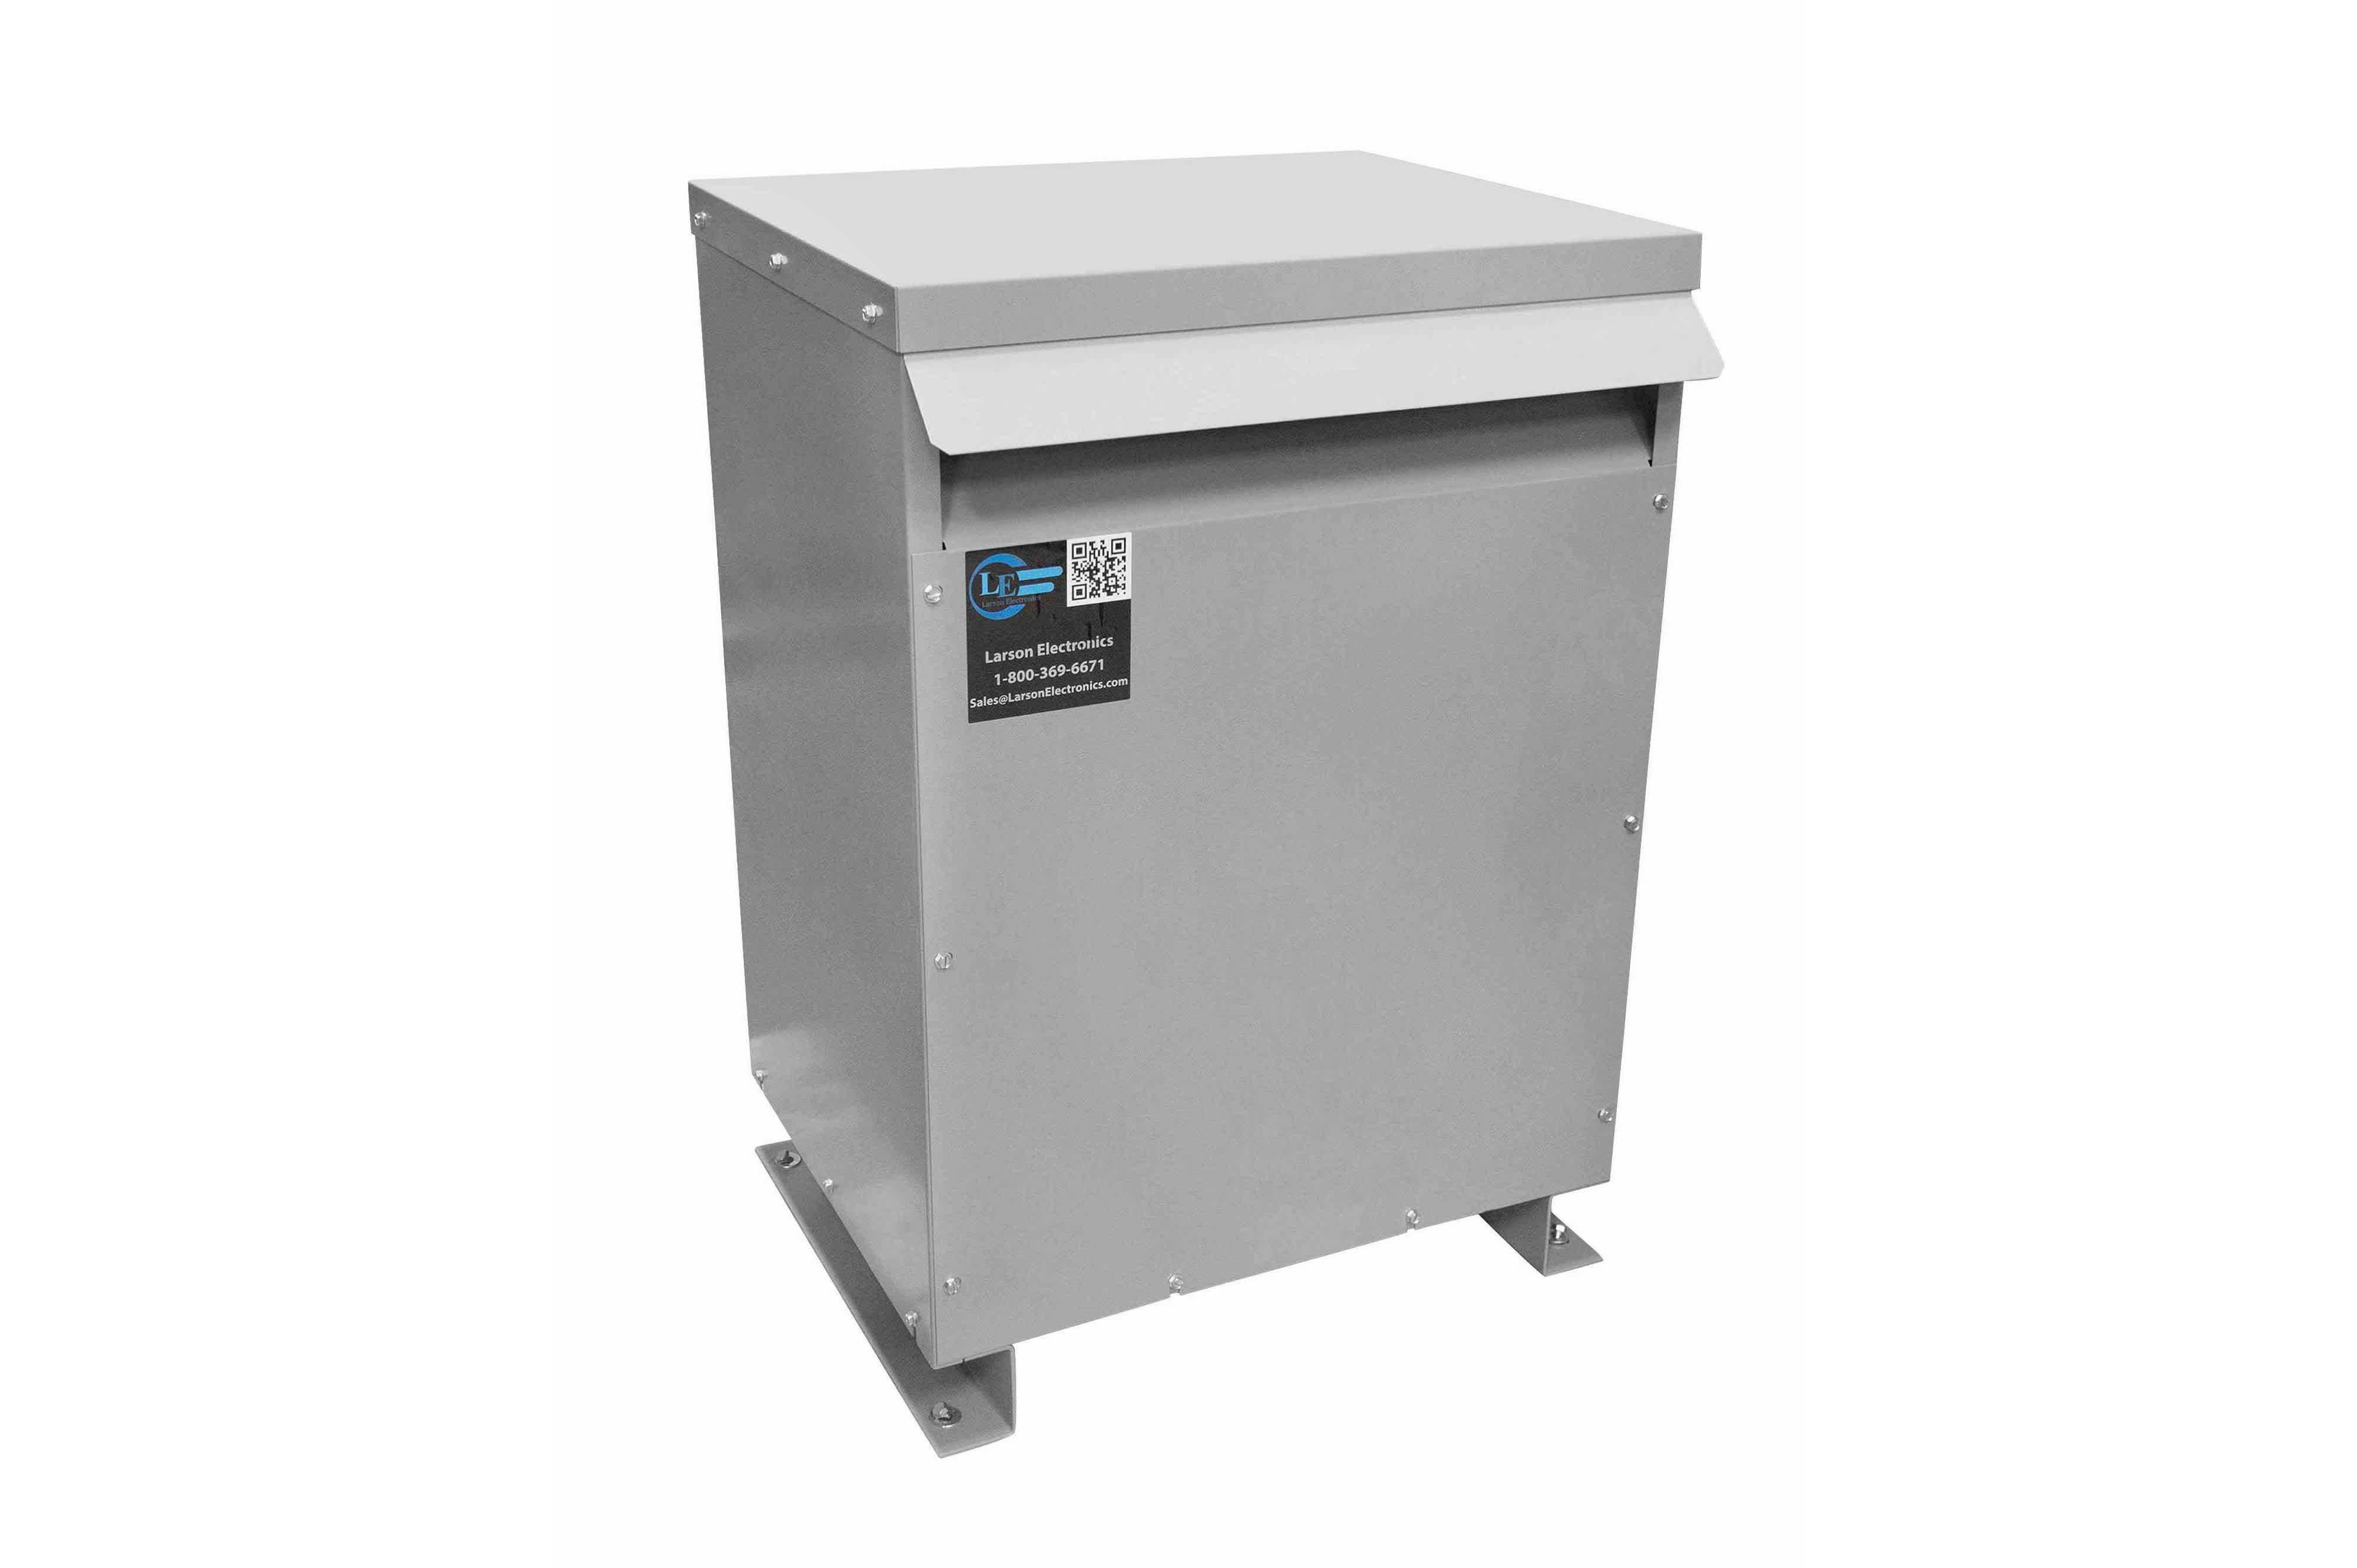 29 kVA 3PH Isolation Transformer, 460V Wye Primary, 600V Delta Secondary, N3R, Ventilated, 60 Hz